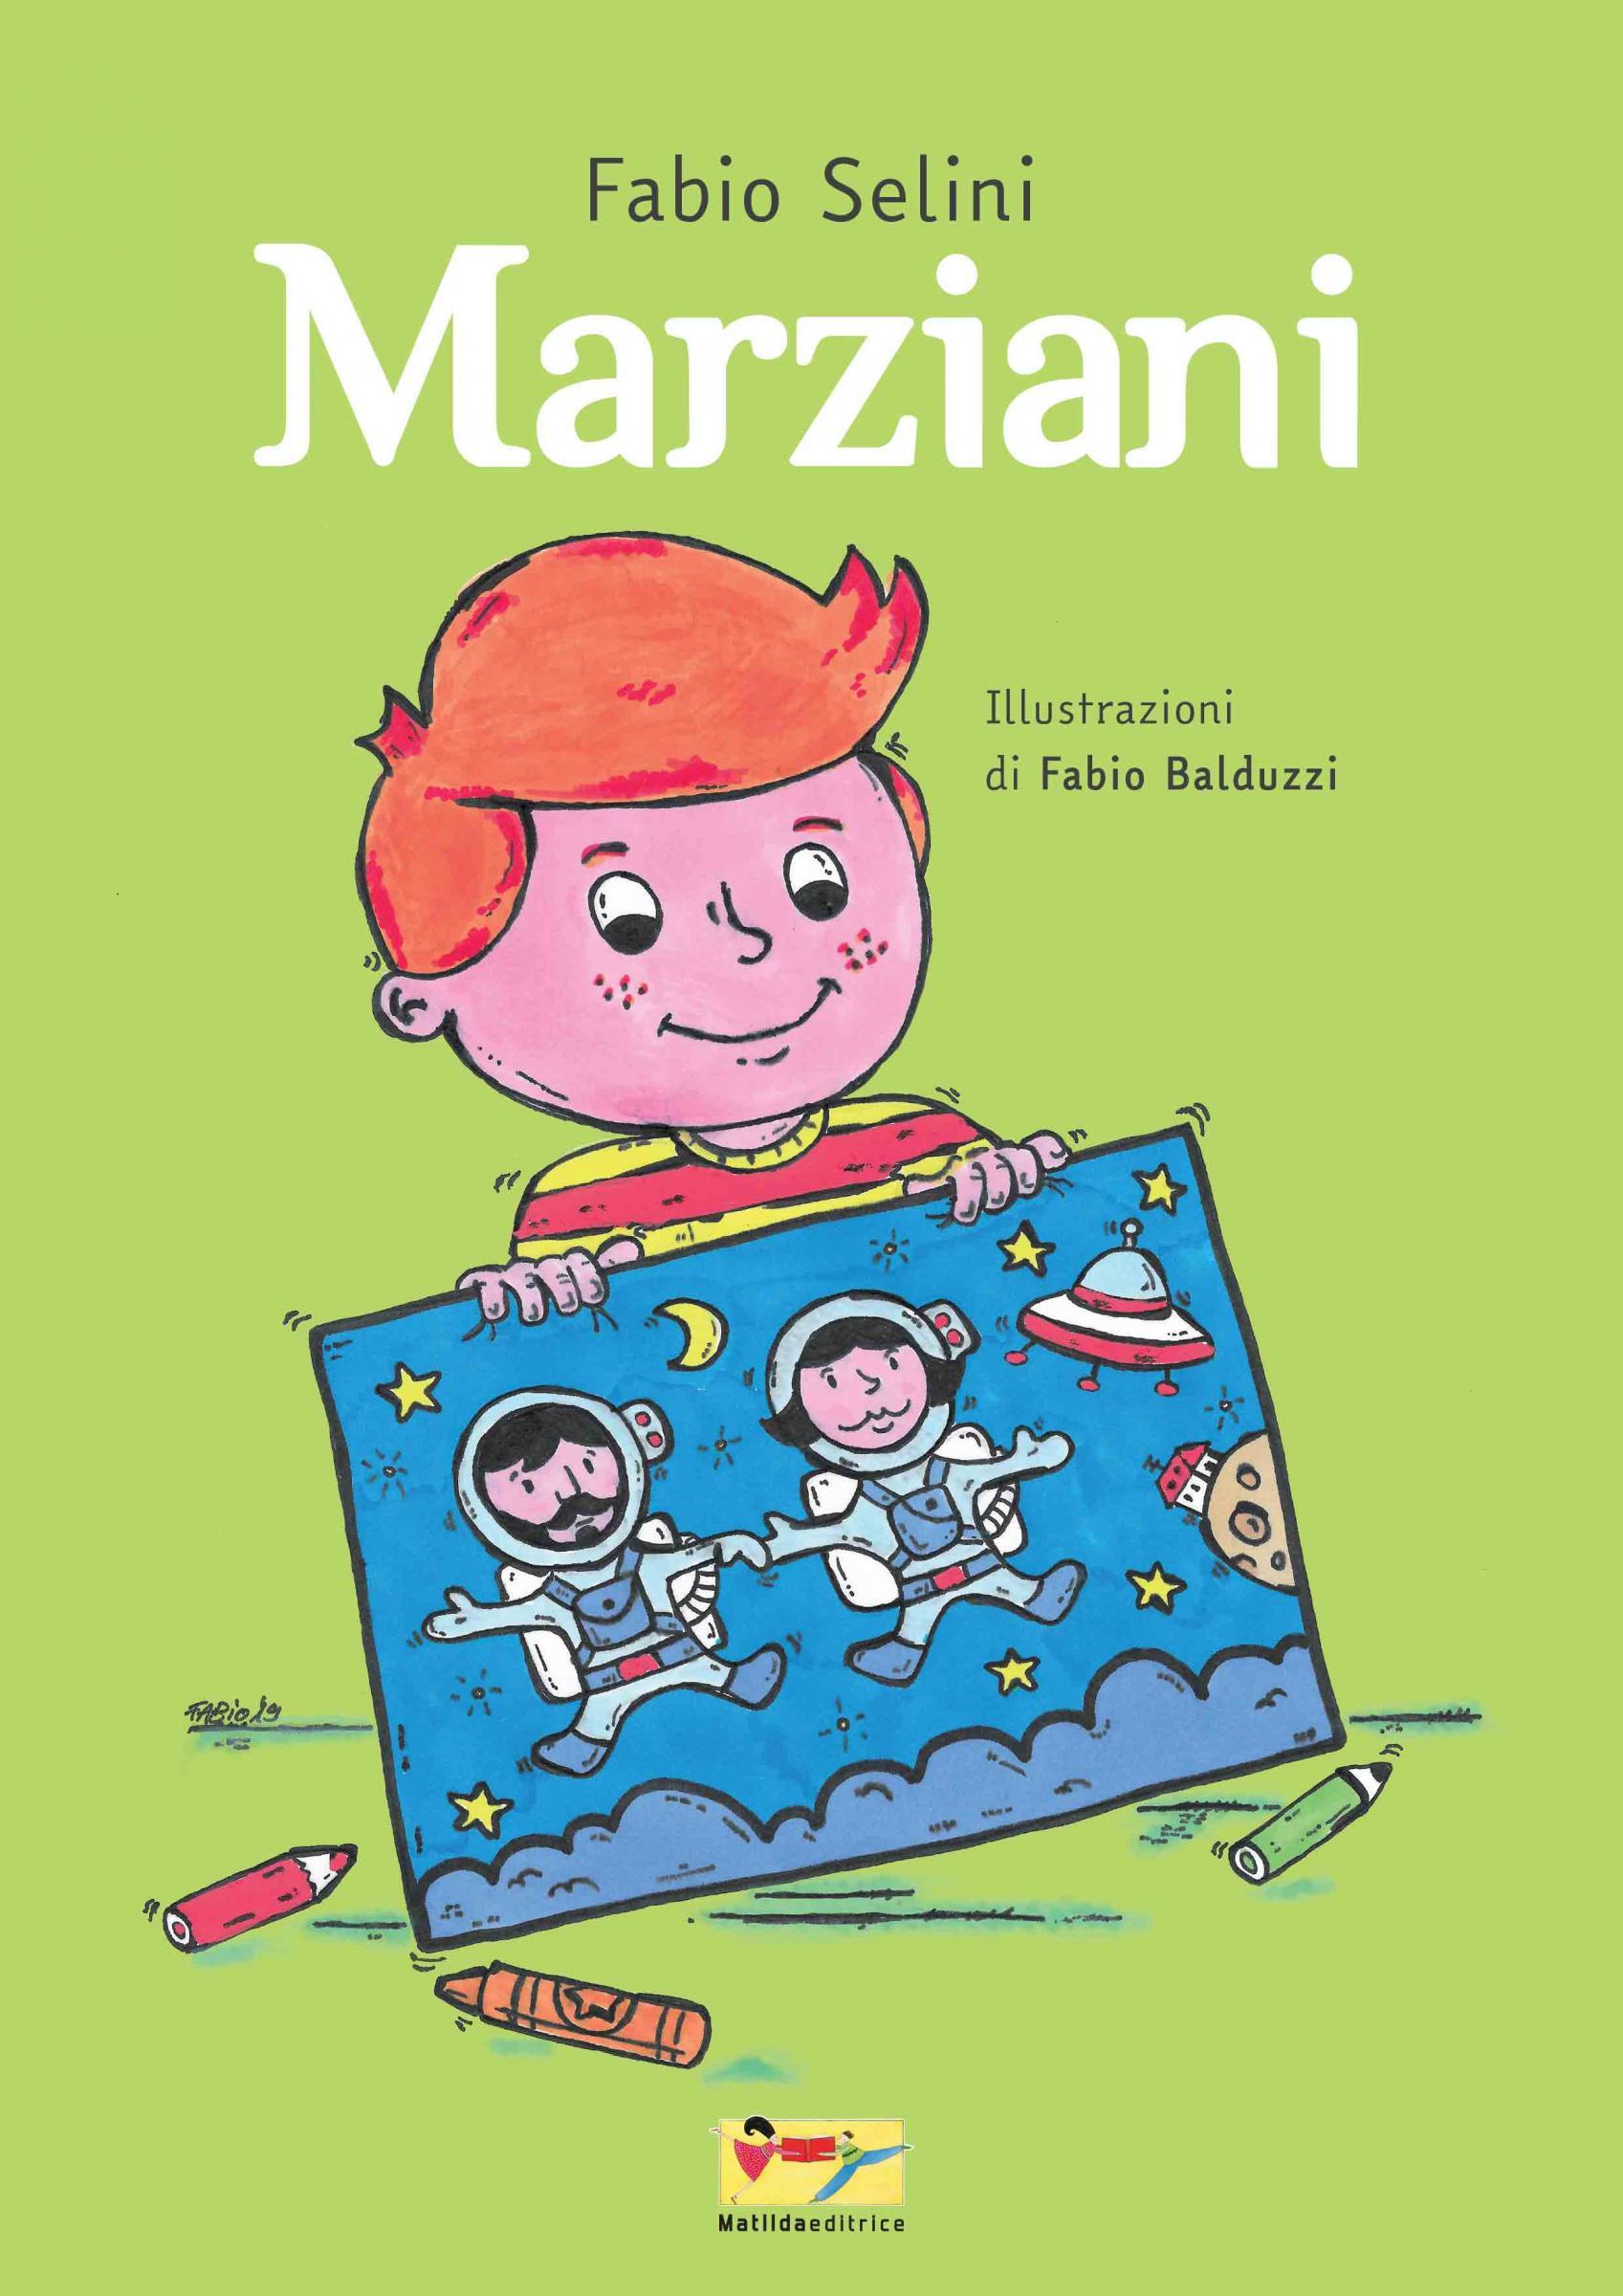 Marziani   Casa Editrice Mammeonline diventa Matilda editrice